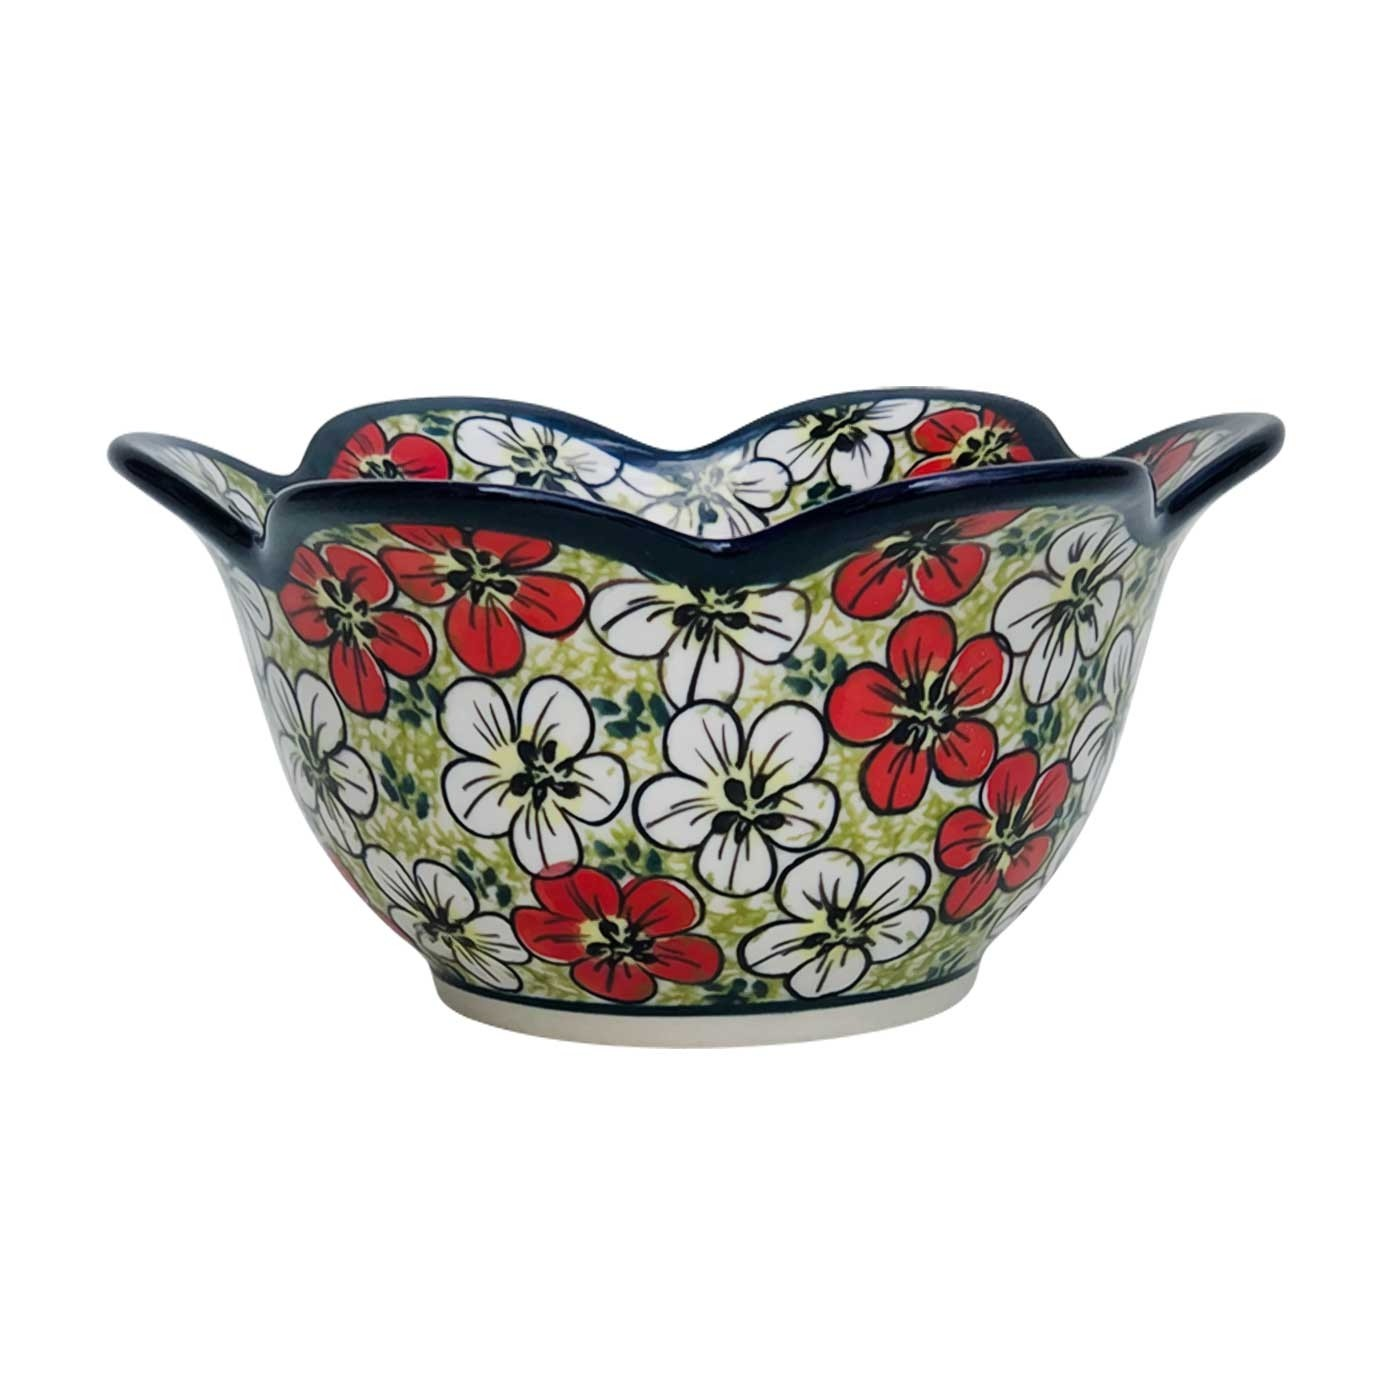 Pottery Avenue Stoneware Tulip Peta Bowl - 1868-331AR RED BACOPA